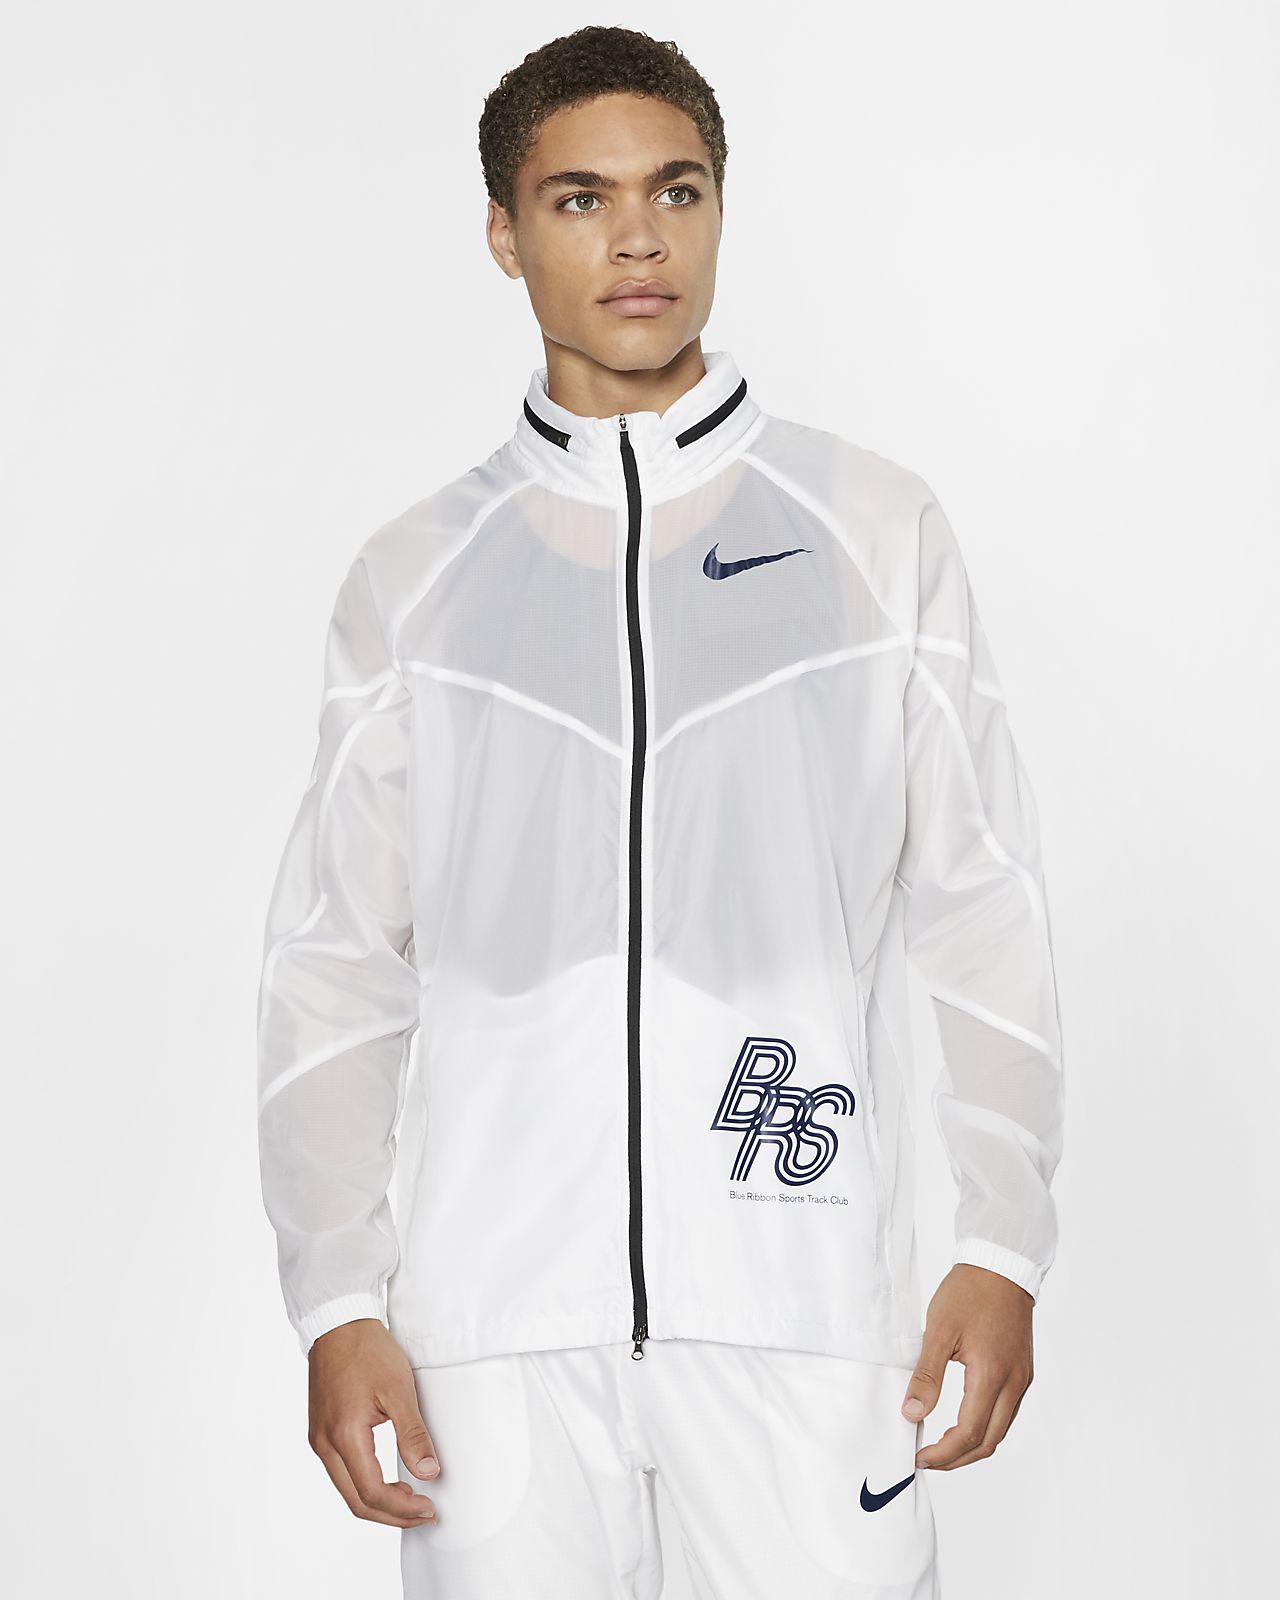 Casaco de treino de running Nike BRS